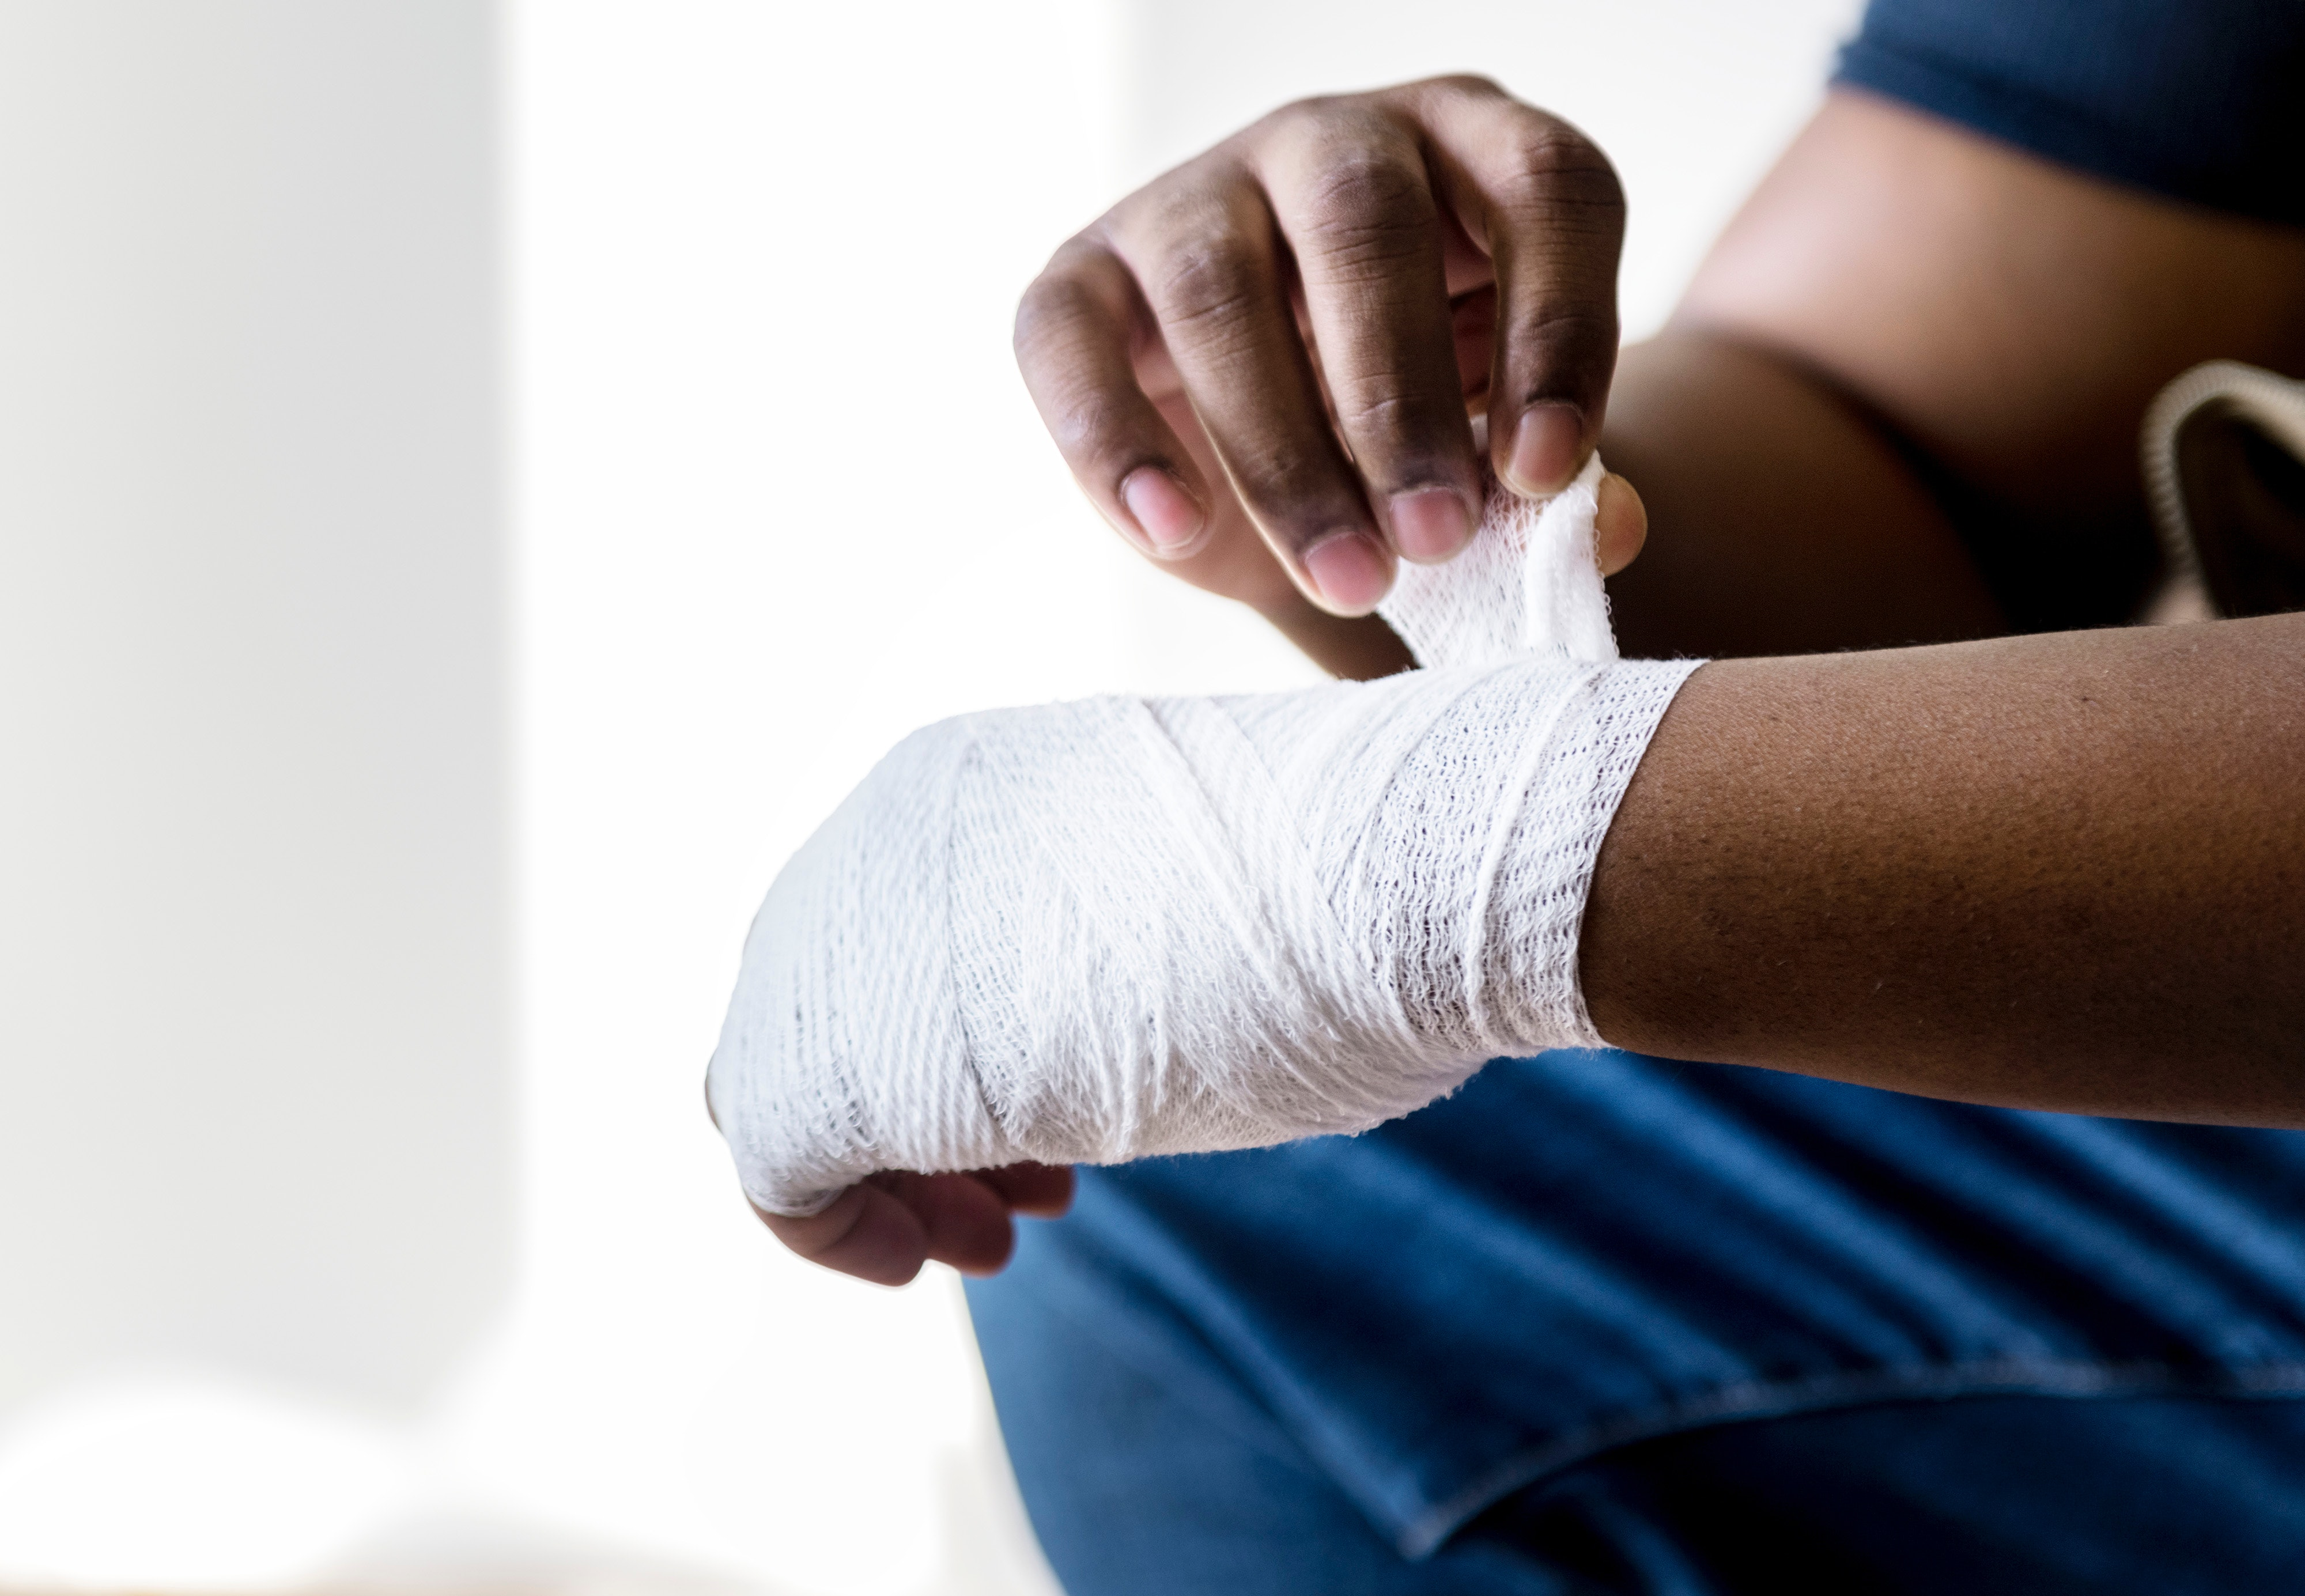 arm-bandage-hands-1409706